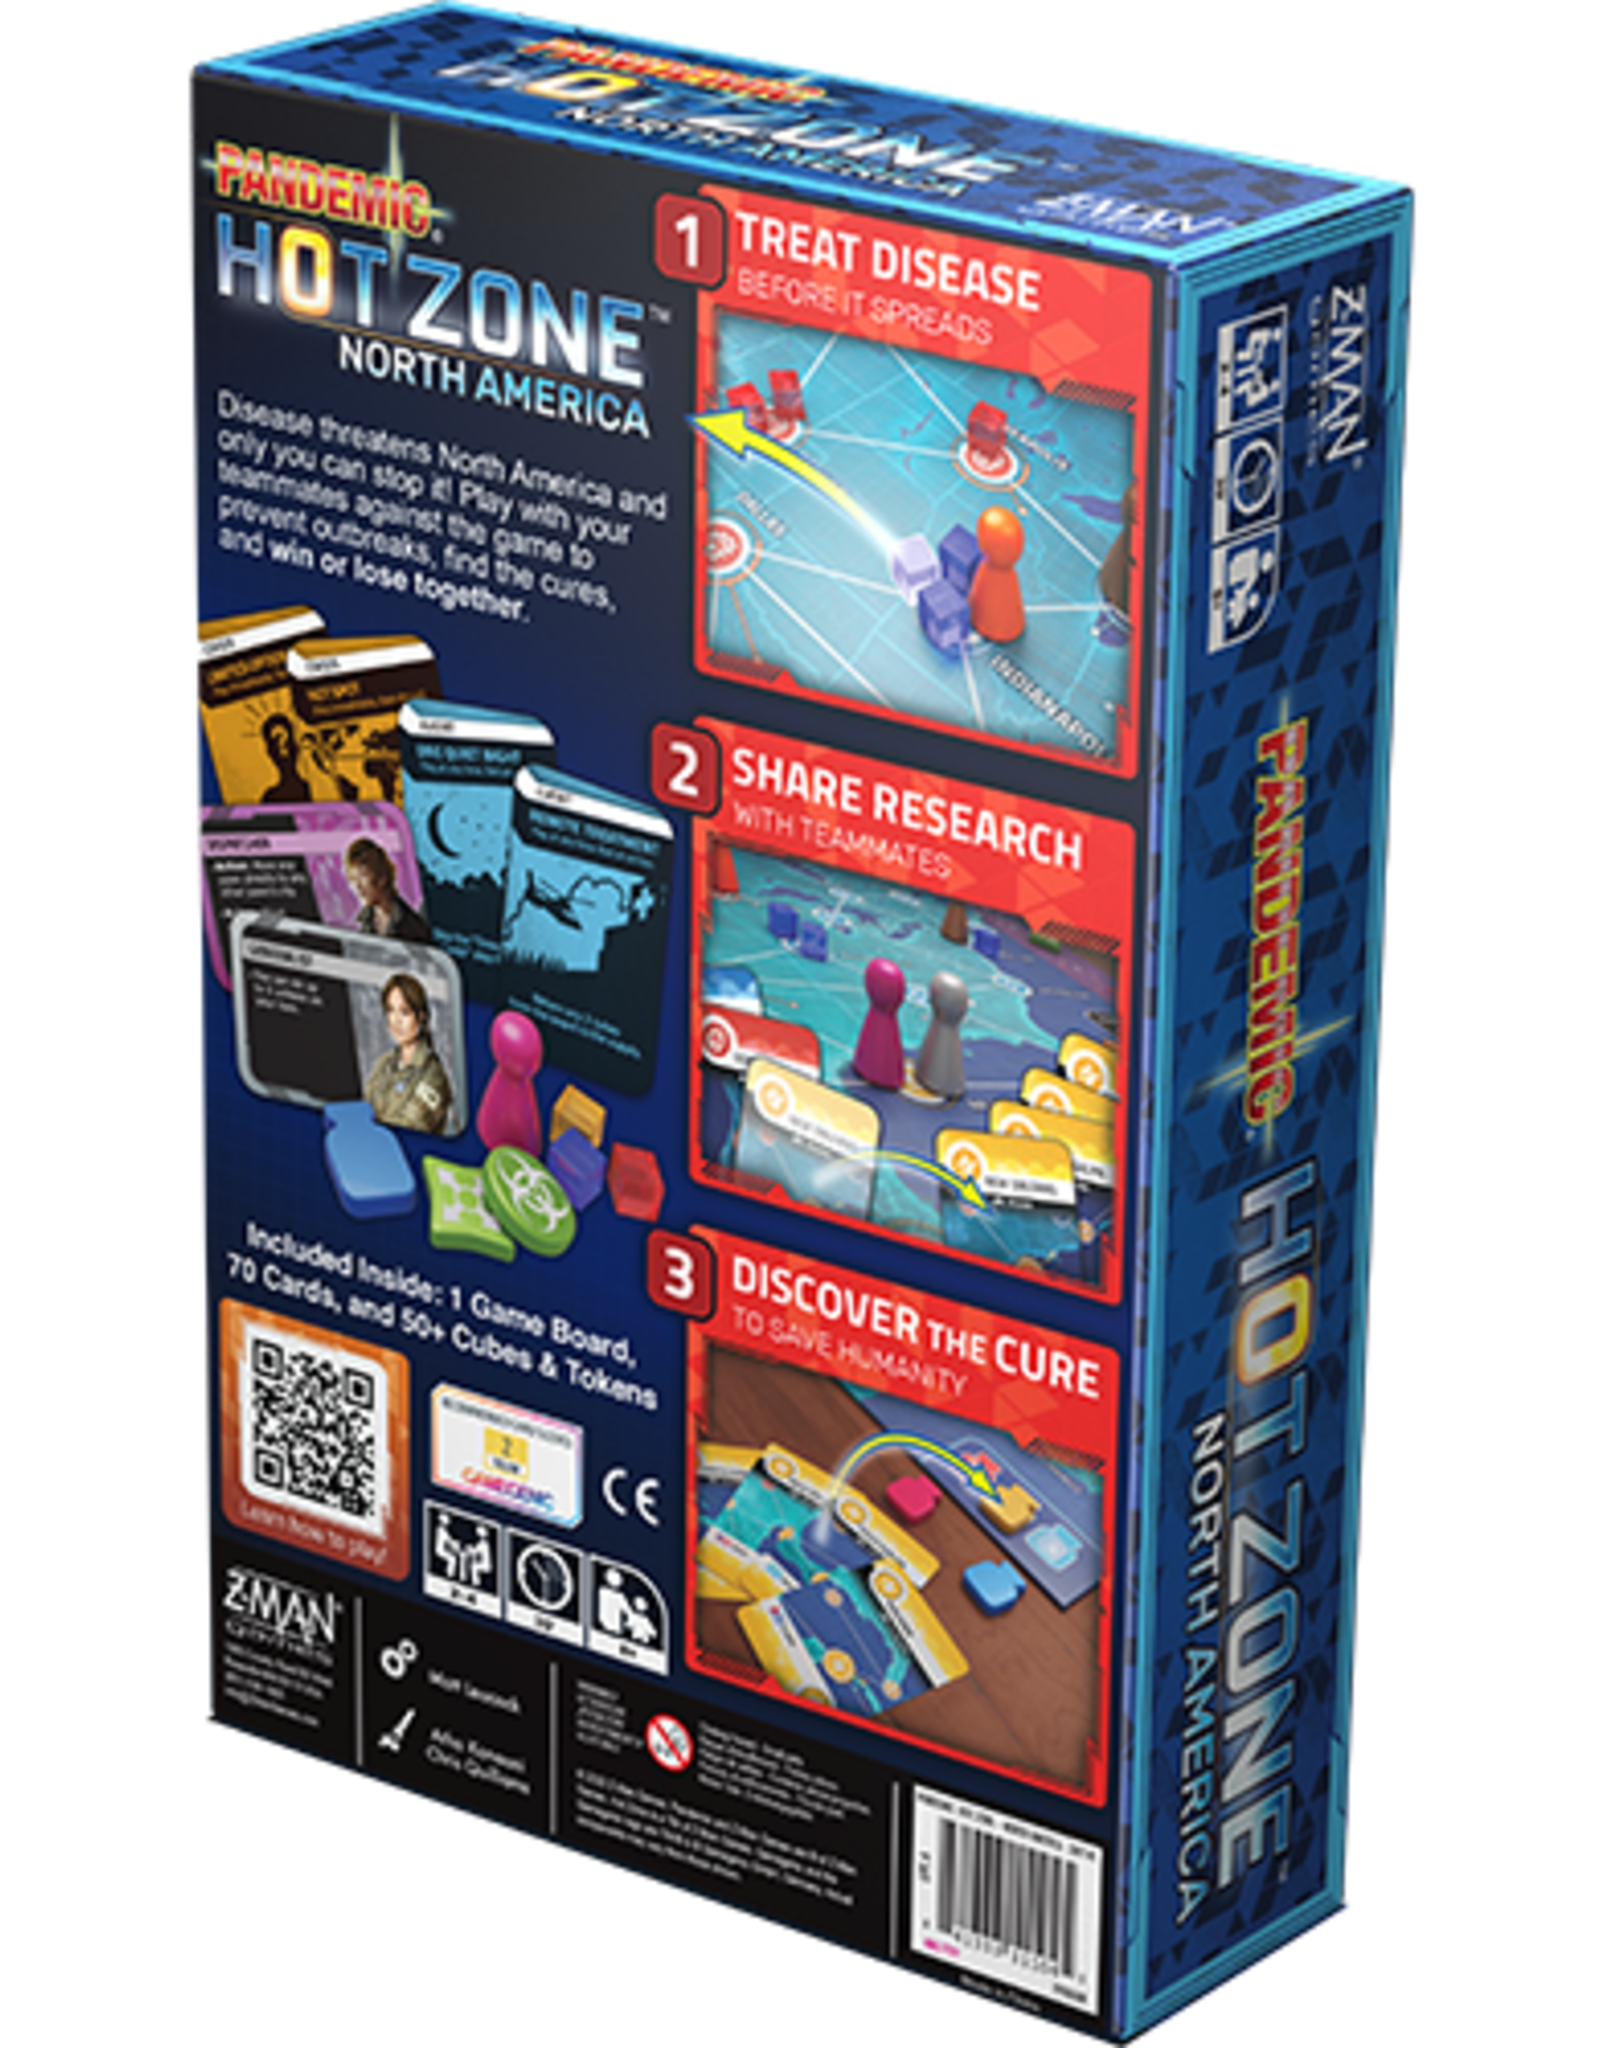 Pandemic Hot Zone North America (stand alone)